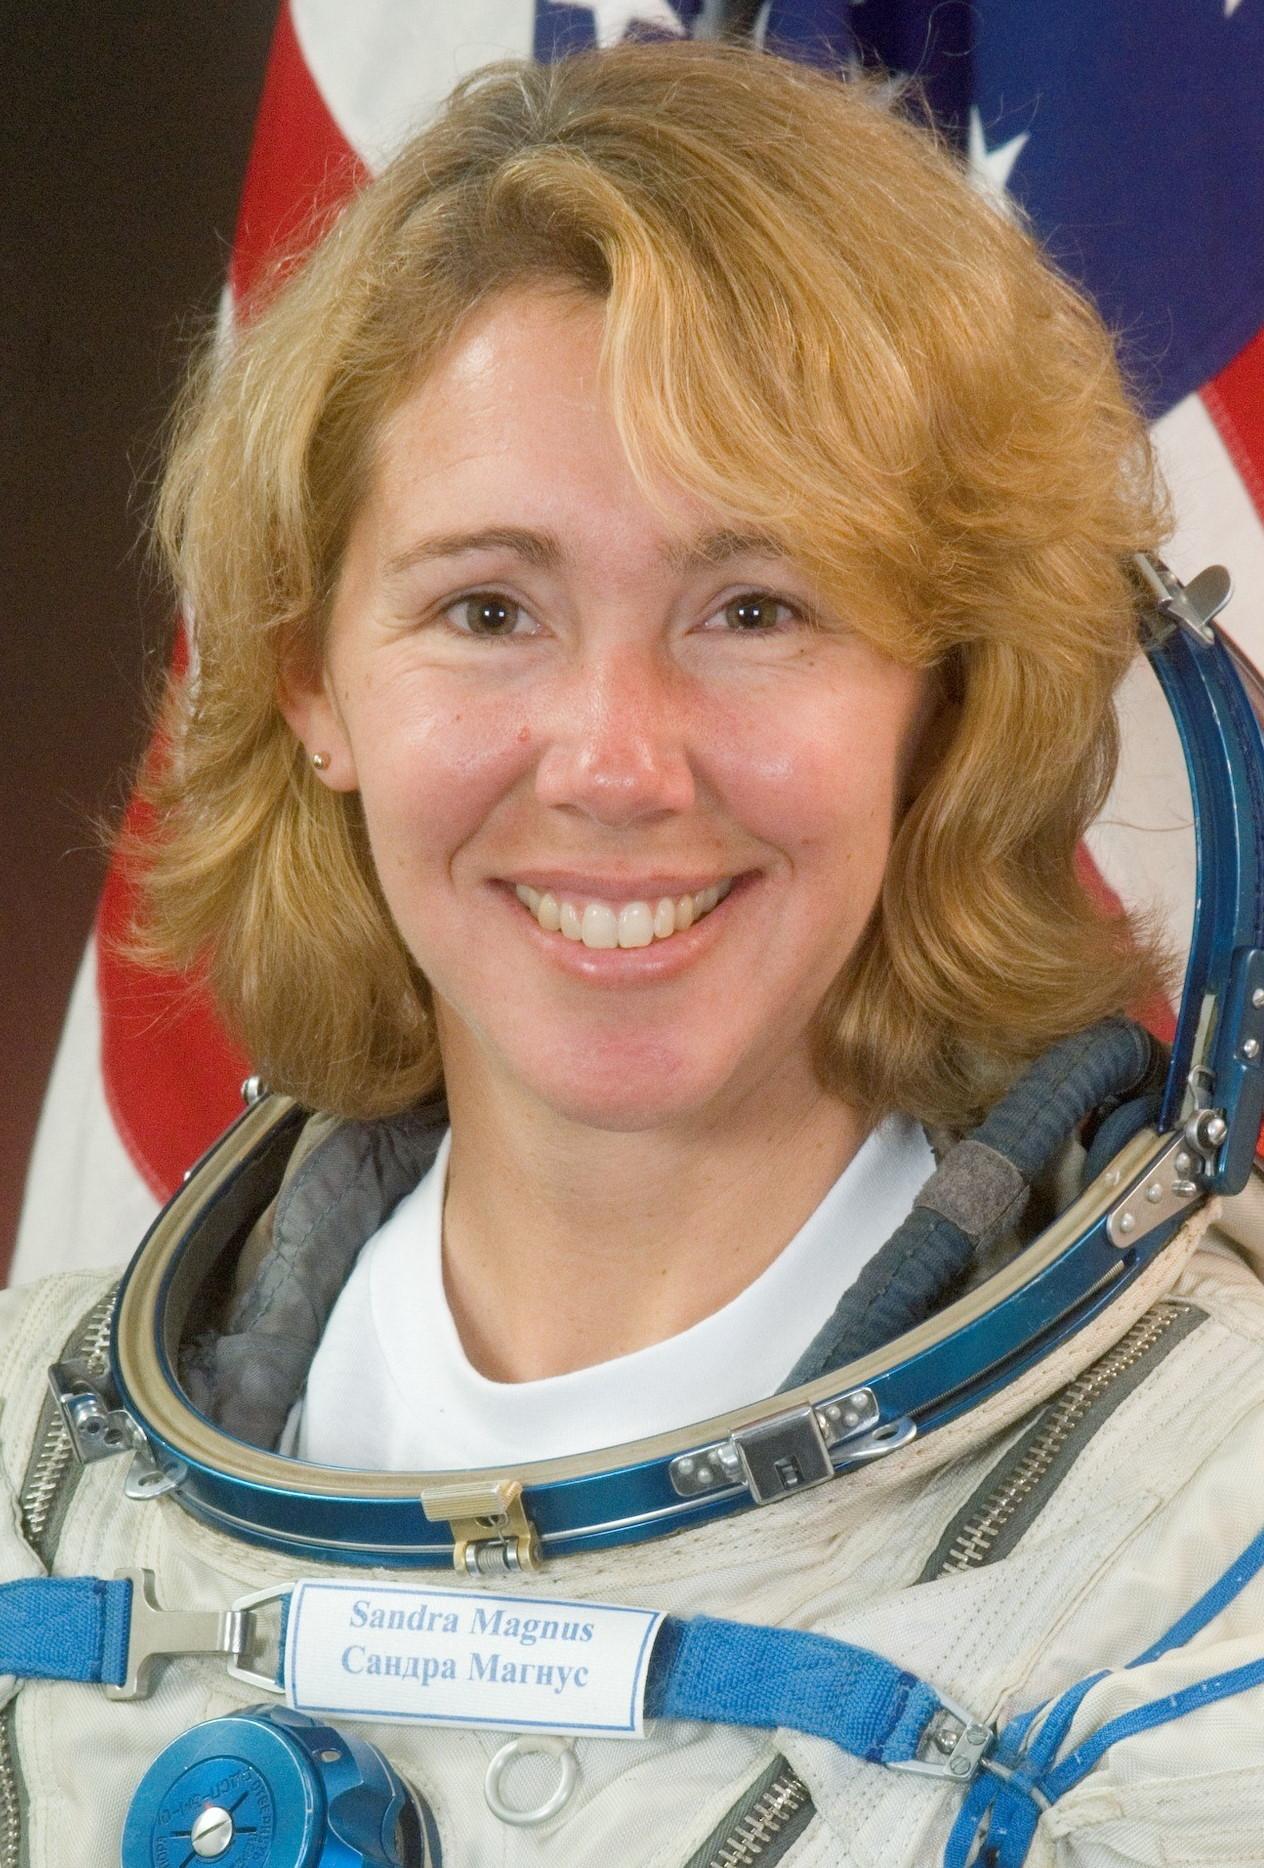 Sandra Magnus (NASA)